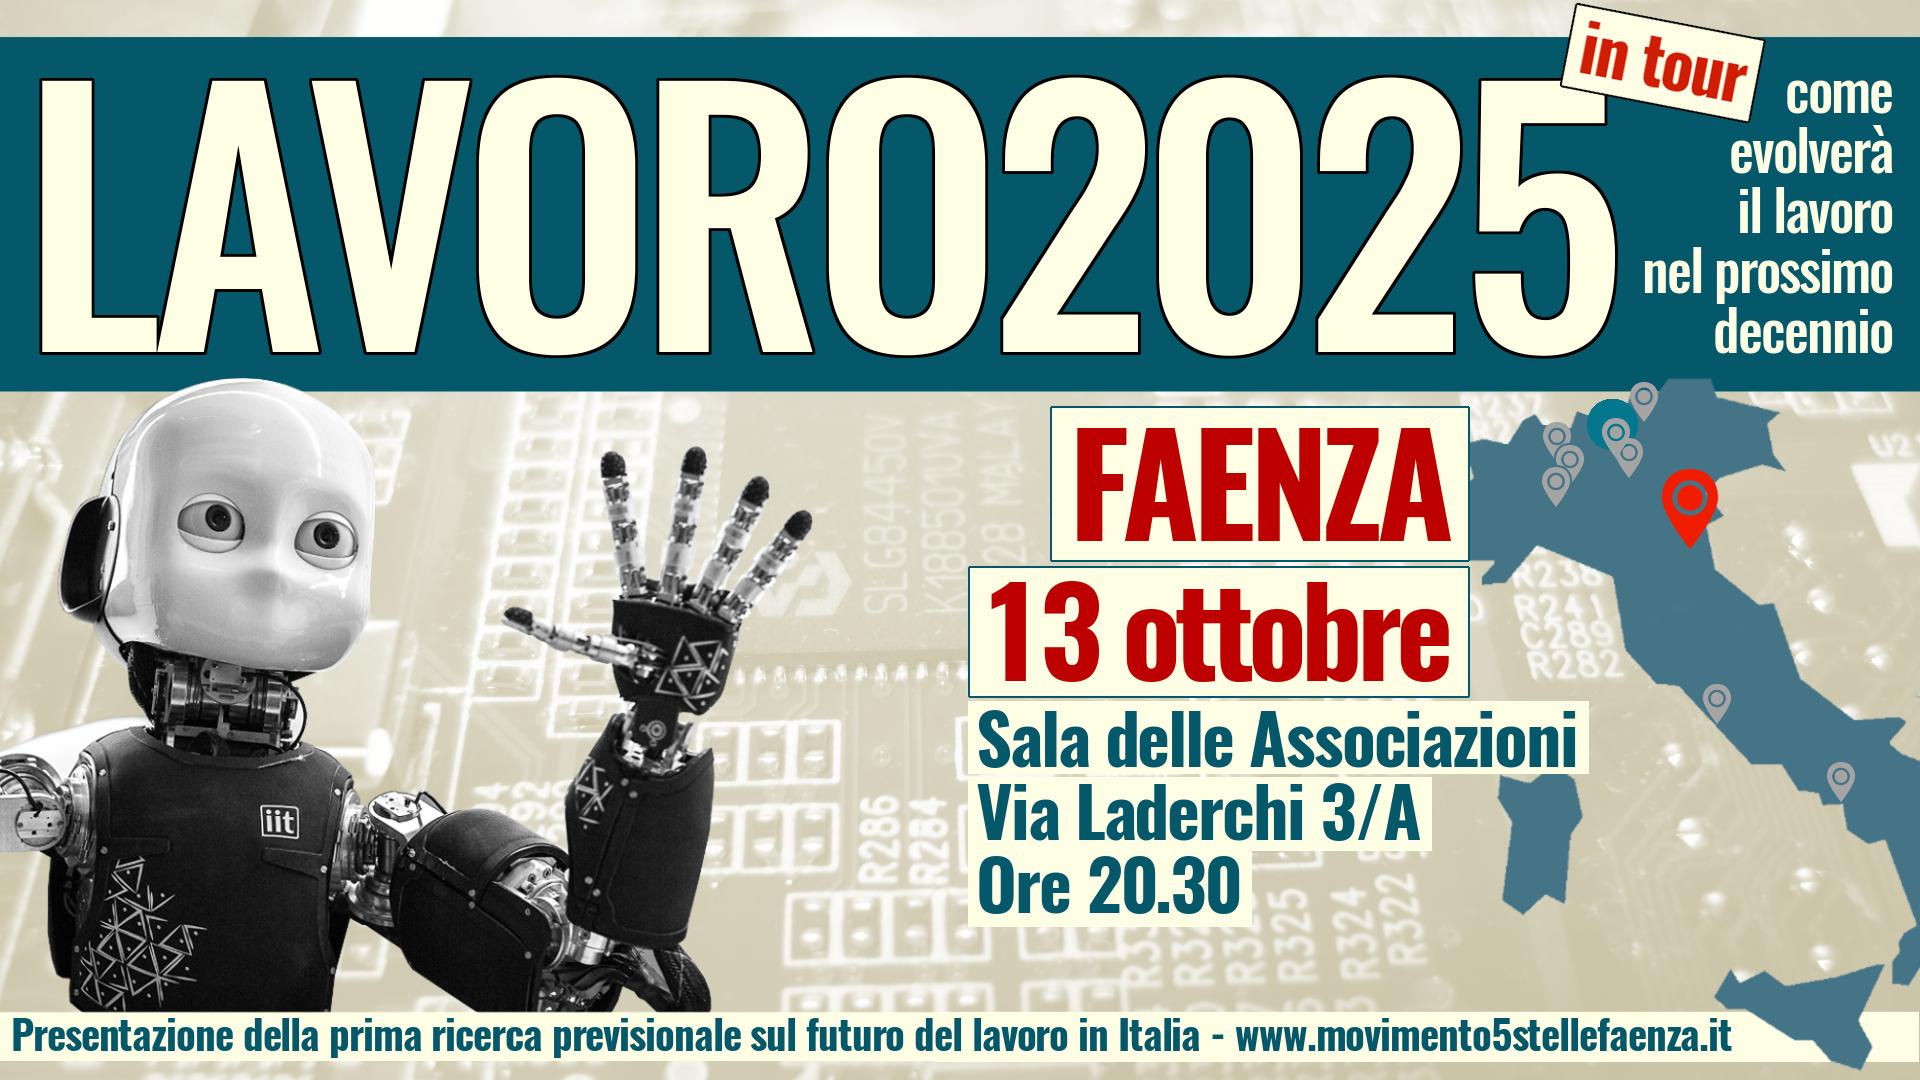 Lavoro2025-copertina-FB-FAENZA-v3-100